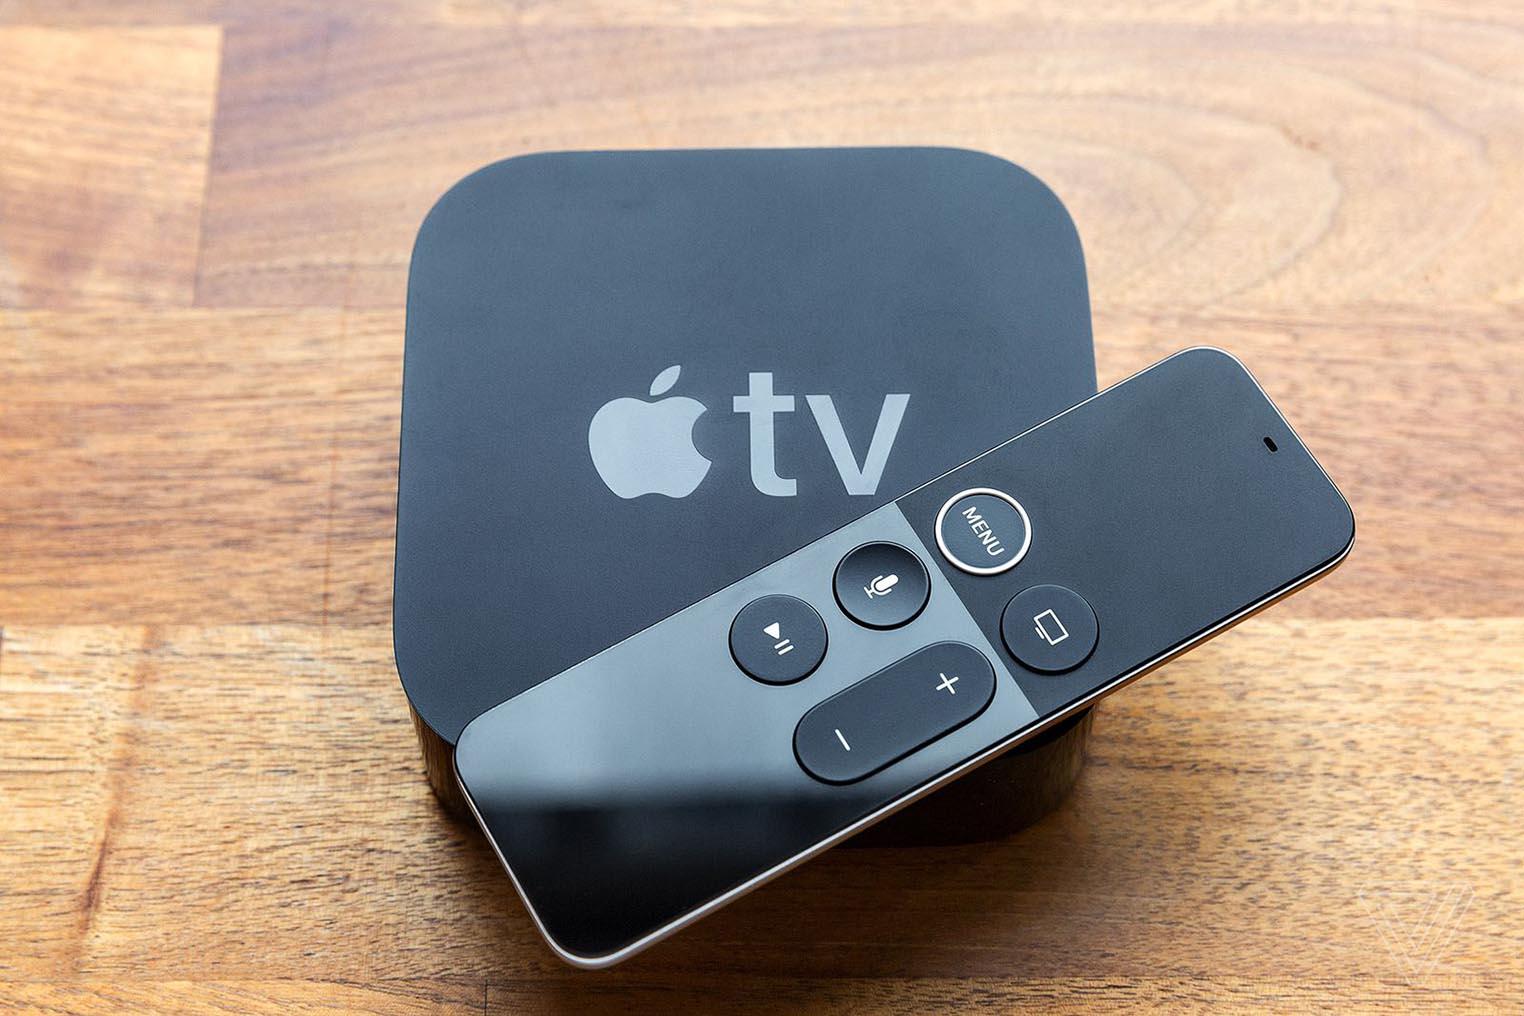 Consomac : Les petites limites de l'Apple TV 4K